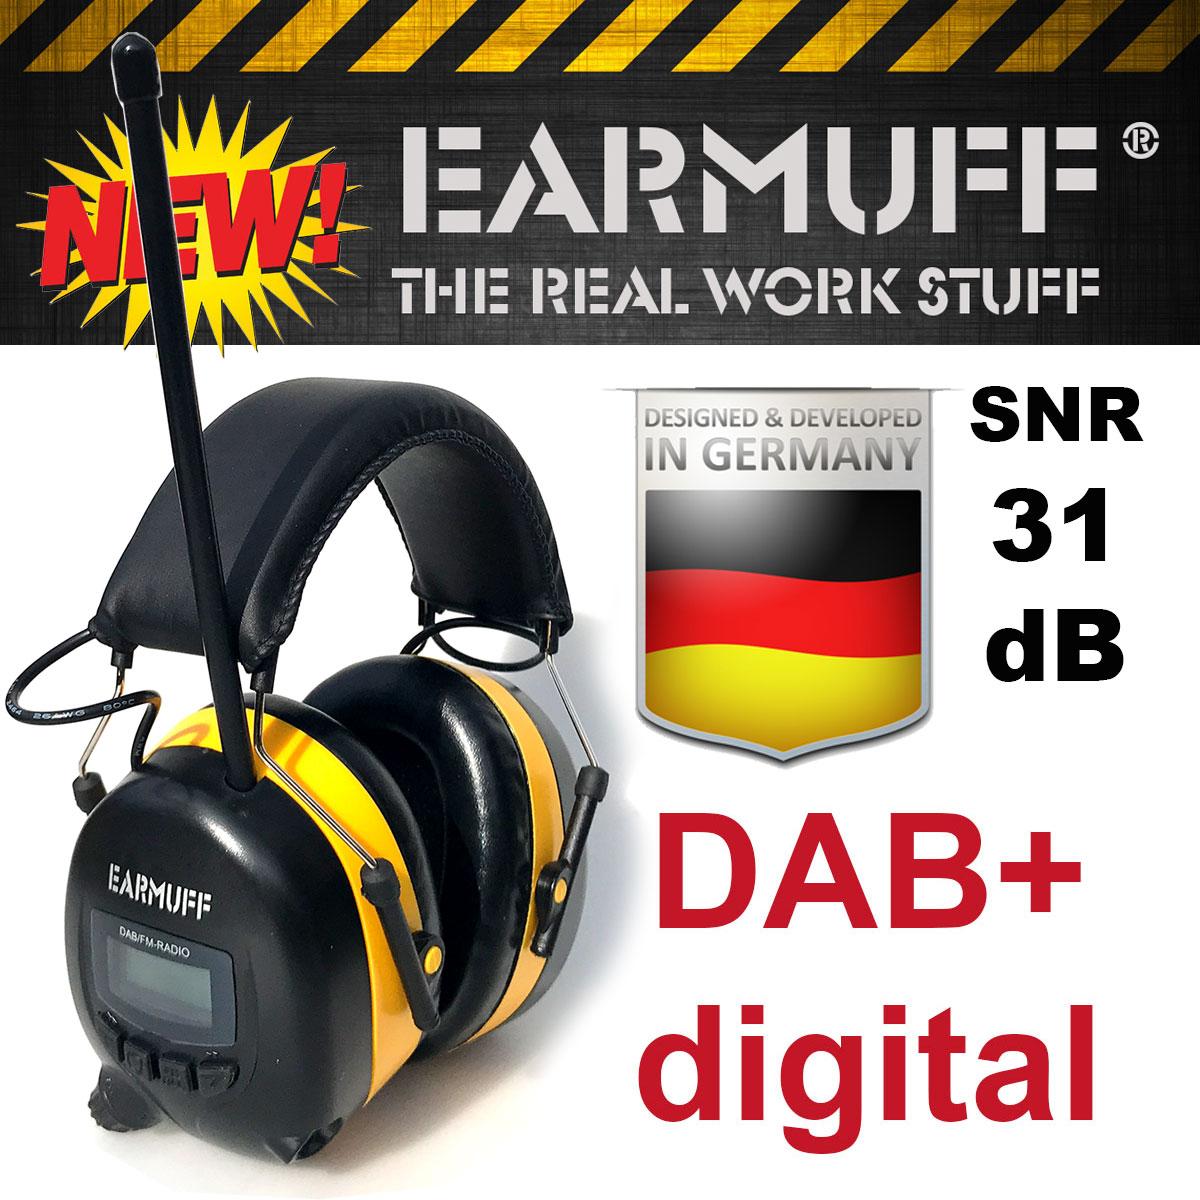 fm dab digital radio 31db earmuff kapselgeh rschutz. Black Bedroom Furniture Sets. Home Design Ideas